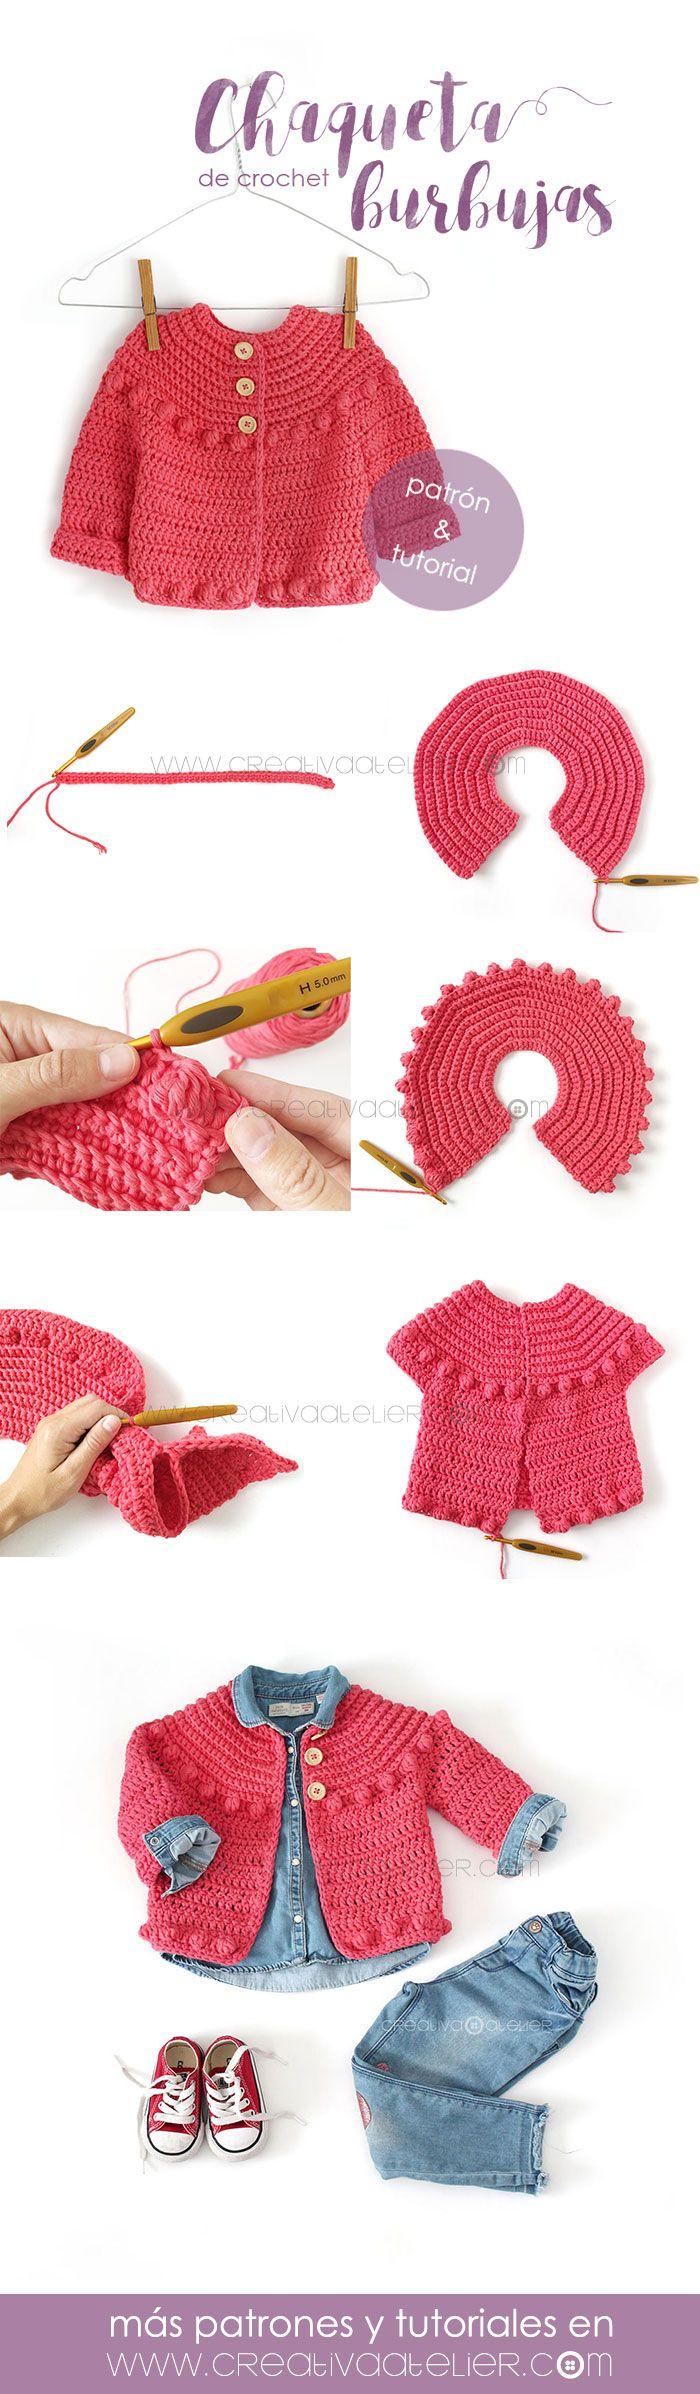 11 mejores imágenes de abrigos tejidos para niñas | Yarns, Knitting ...